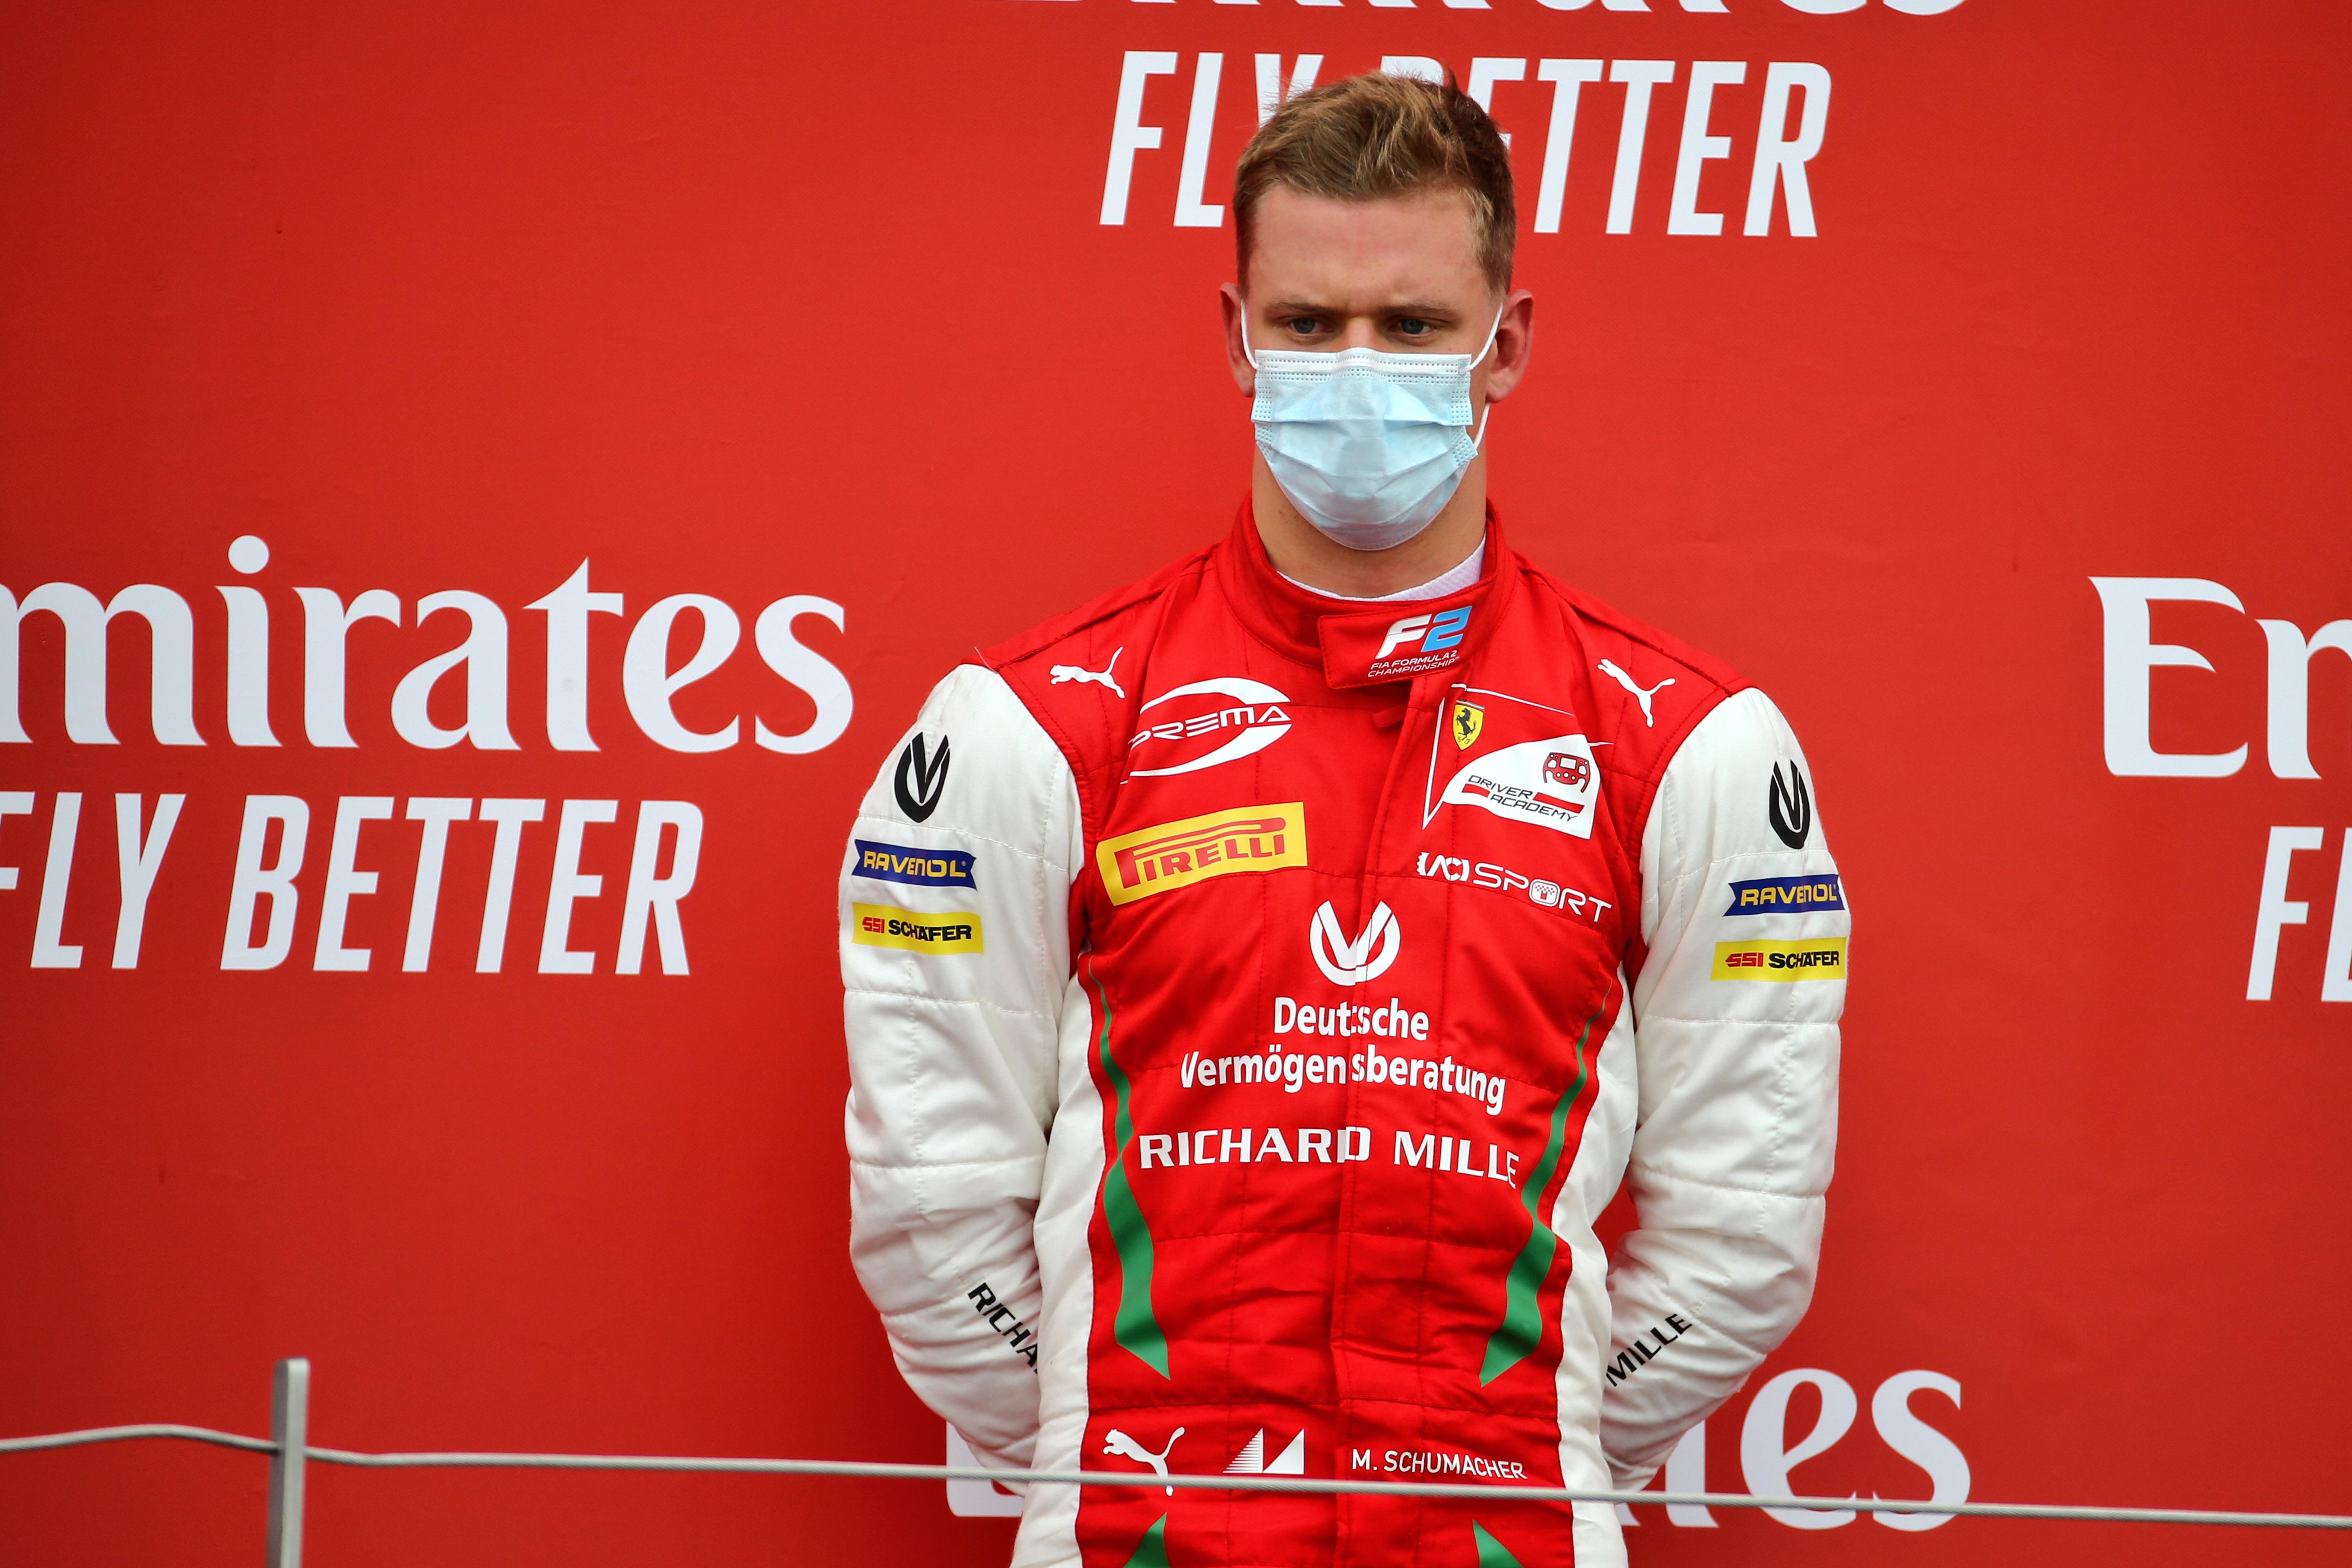 Motor Racing Fia Formula 2 Championship Sunday Silverstone, England